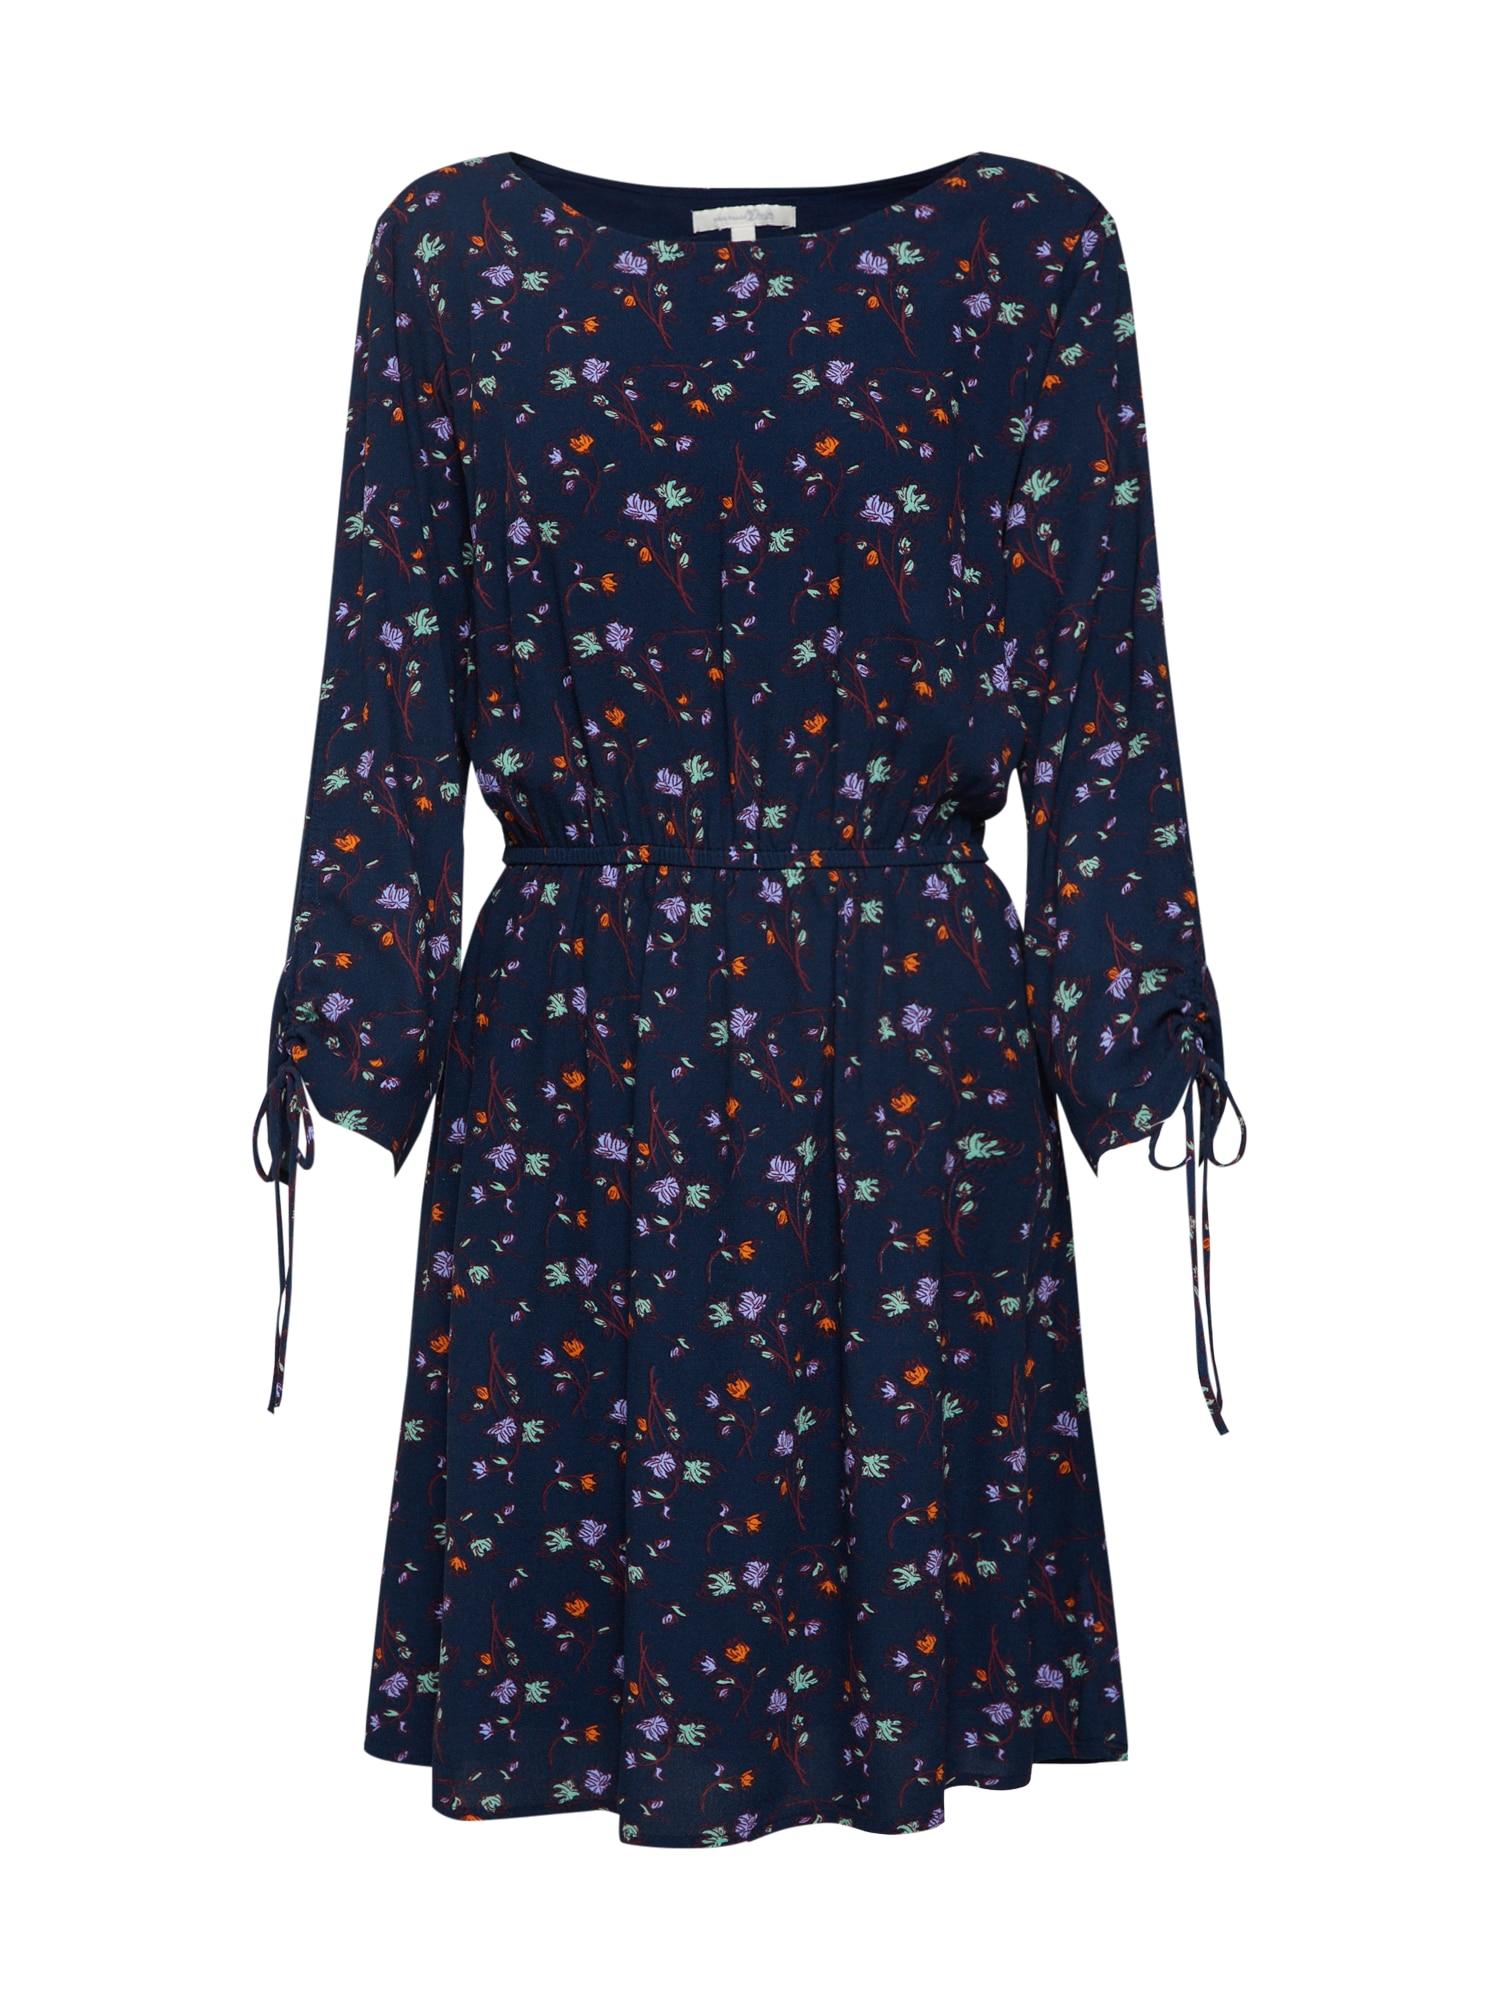 Šaty tmavě modrá mix barev TOM TAILOR DENIM